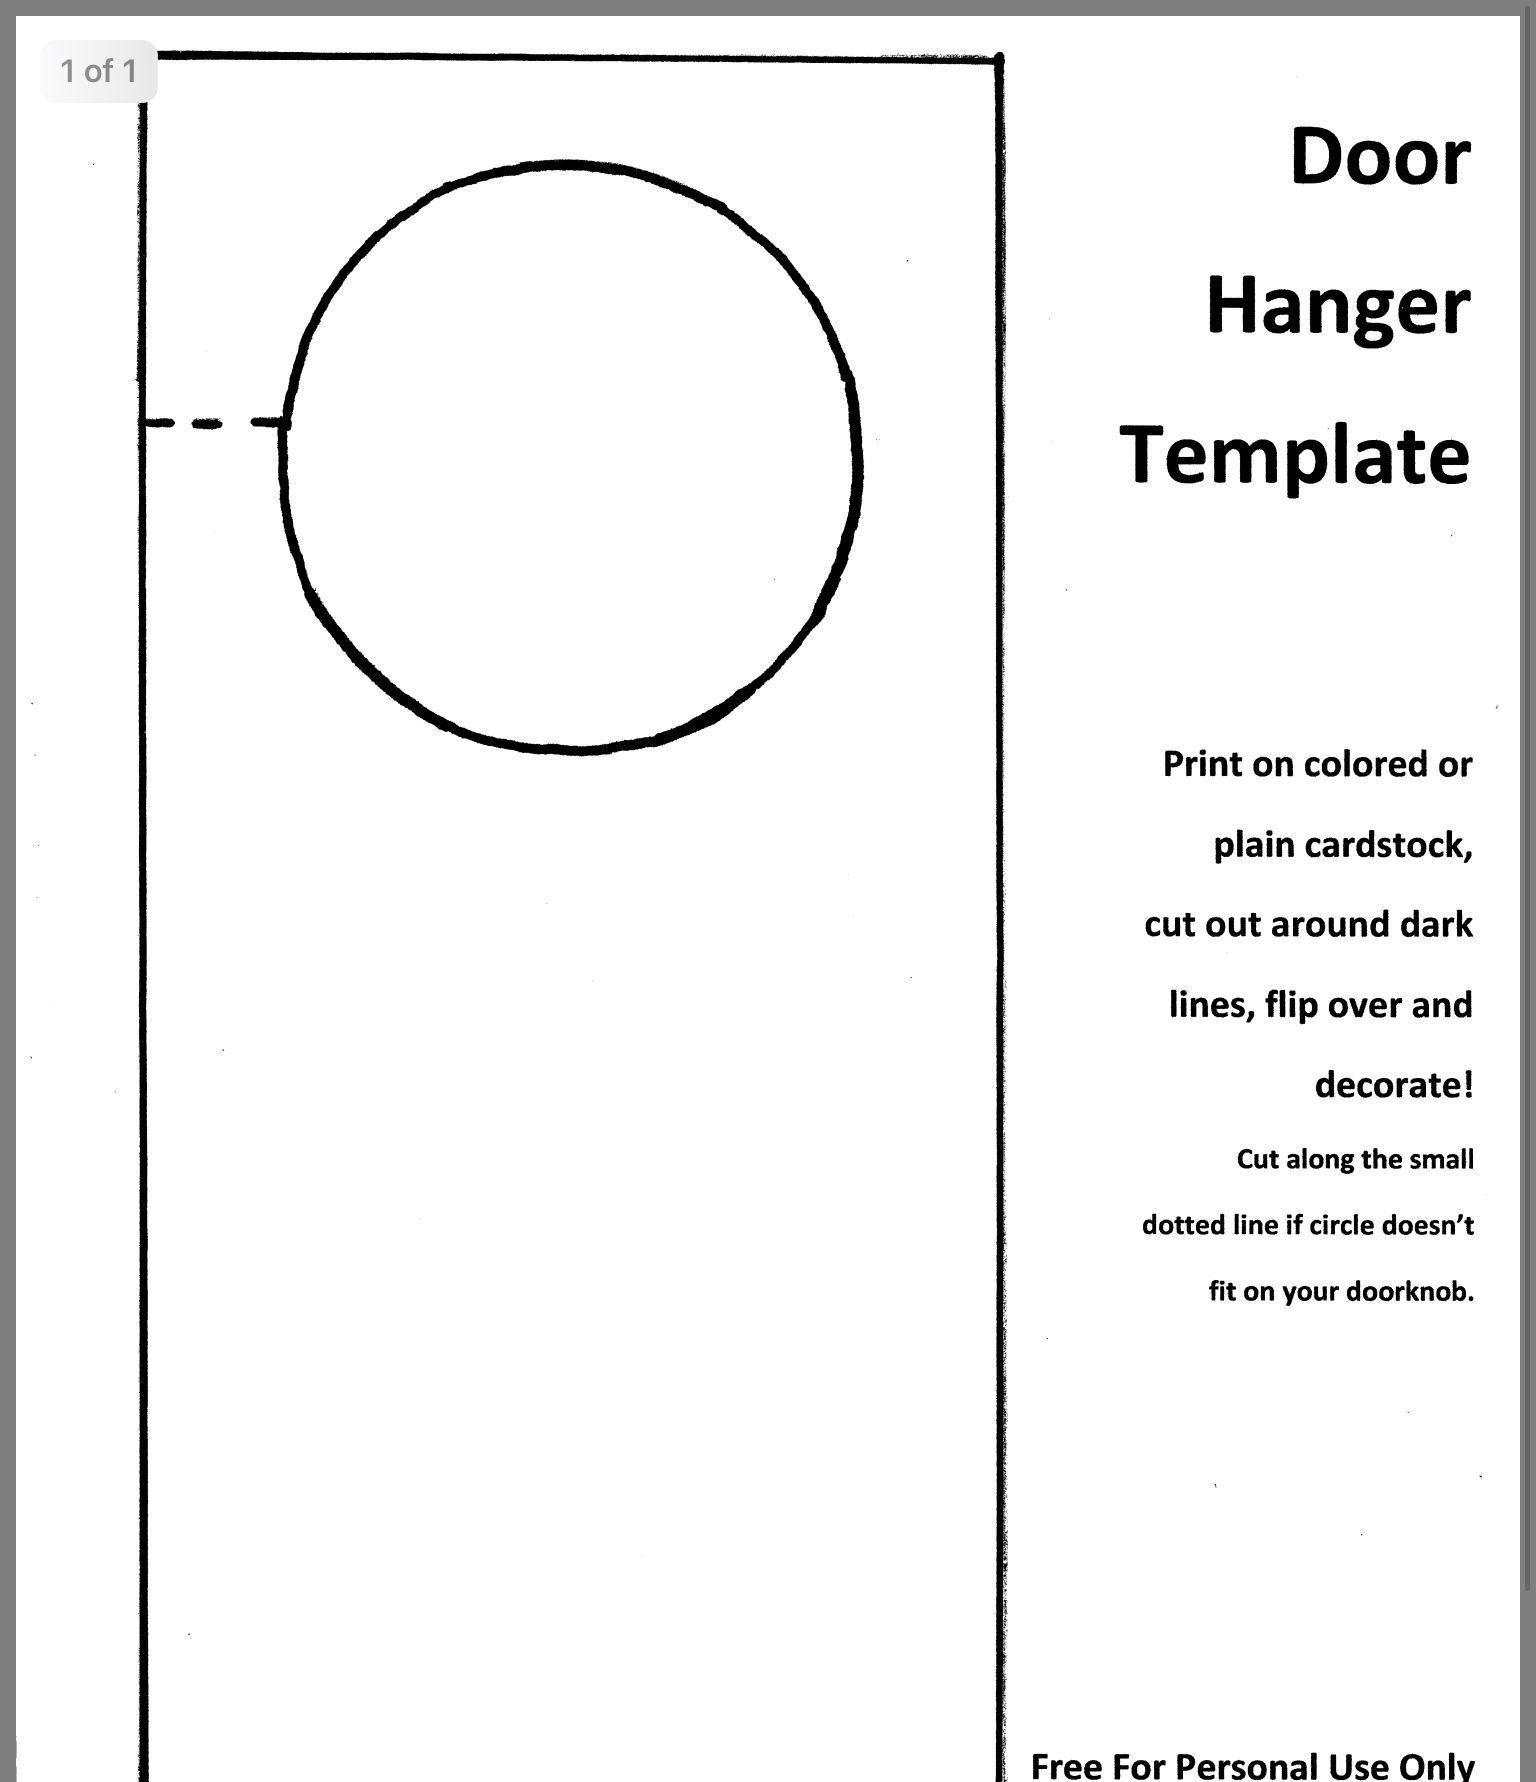 001 Unbelievable Free Printable Template For Door Hanger Highest Clarity Full